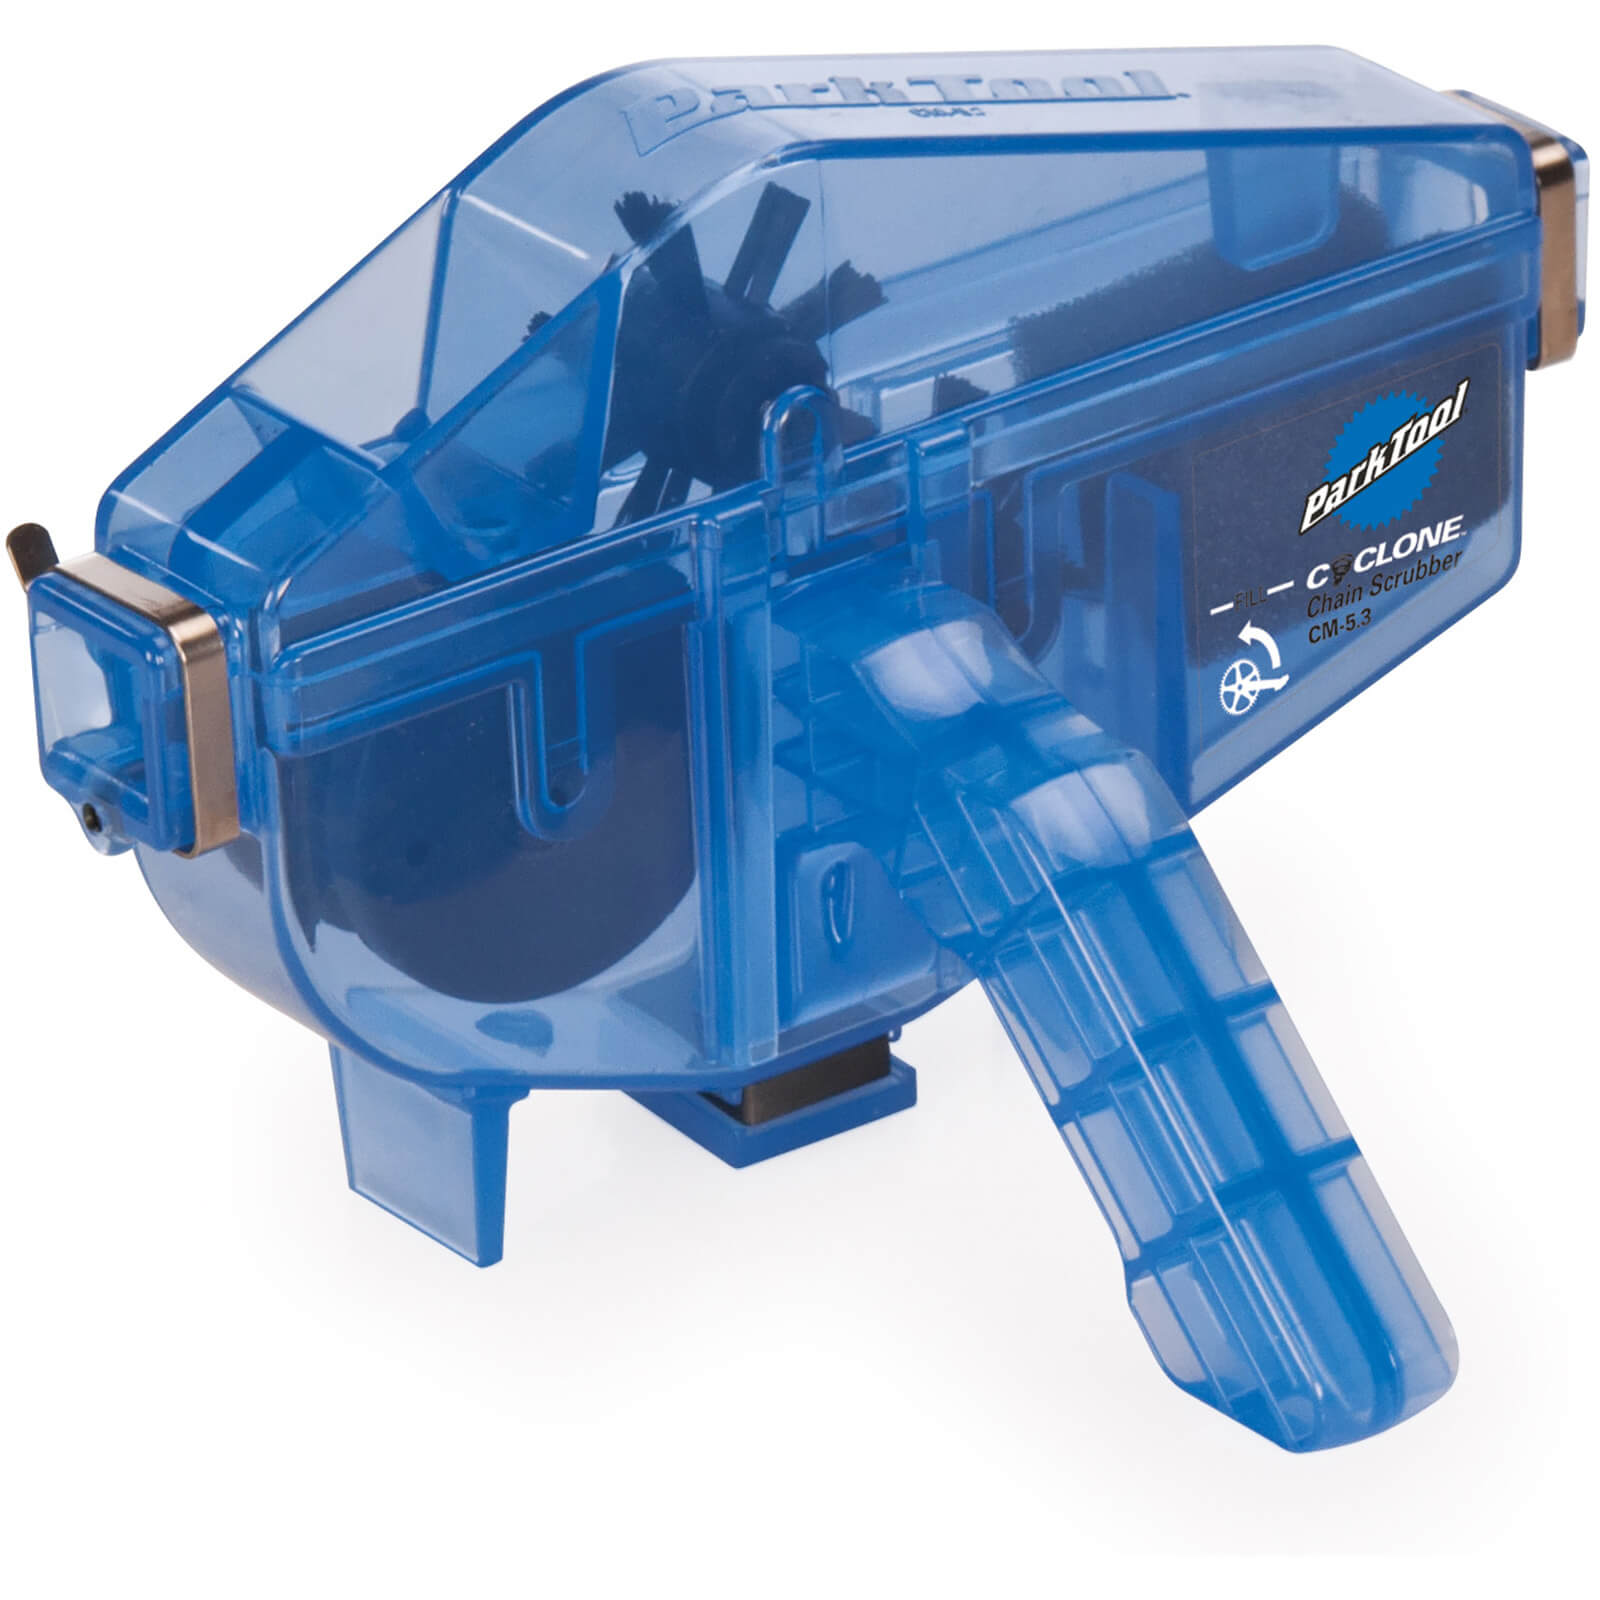 Park Tool CM-5.3 - Cyclone Chain Scrubber